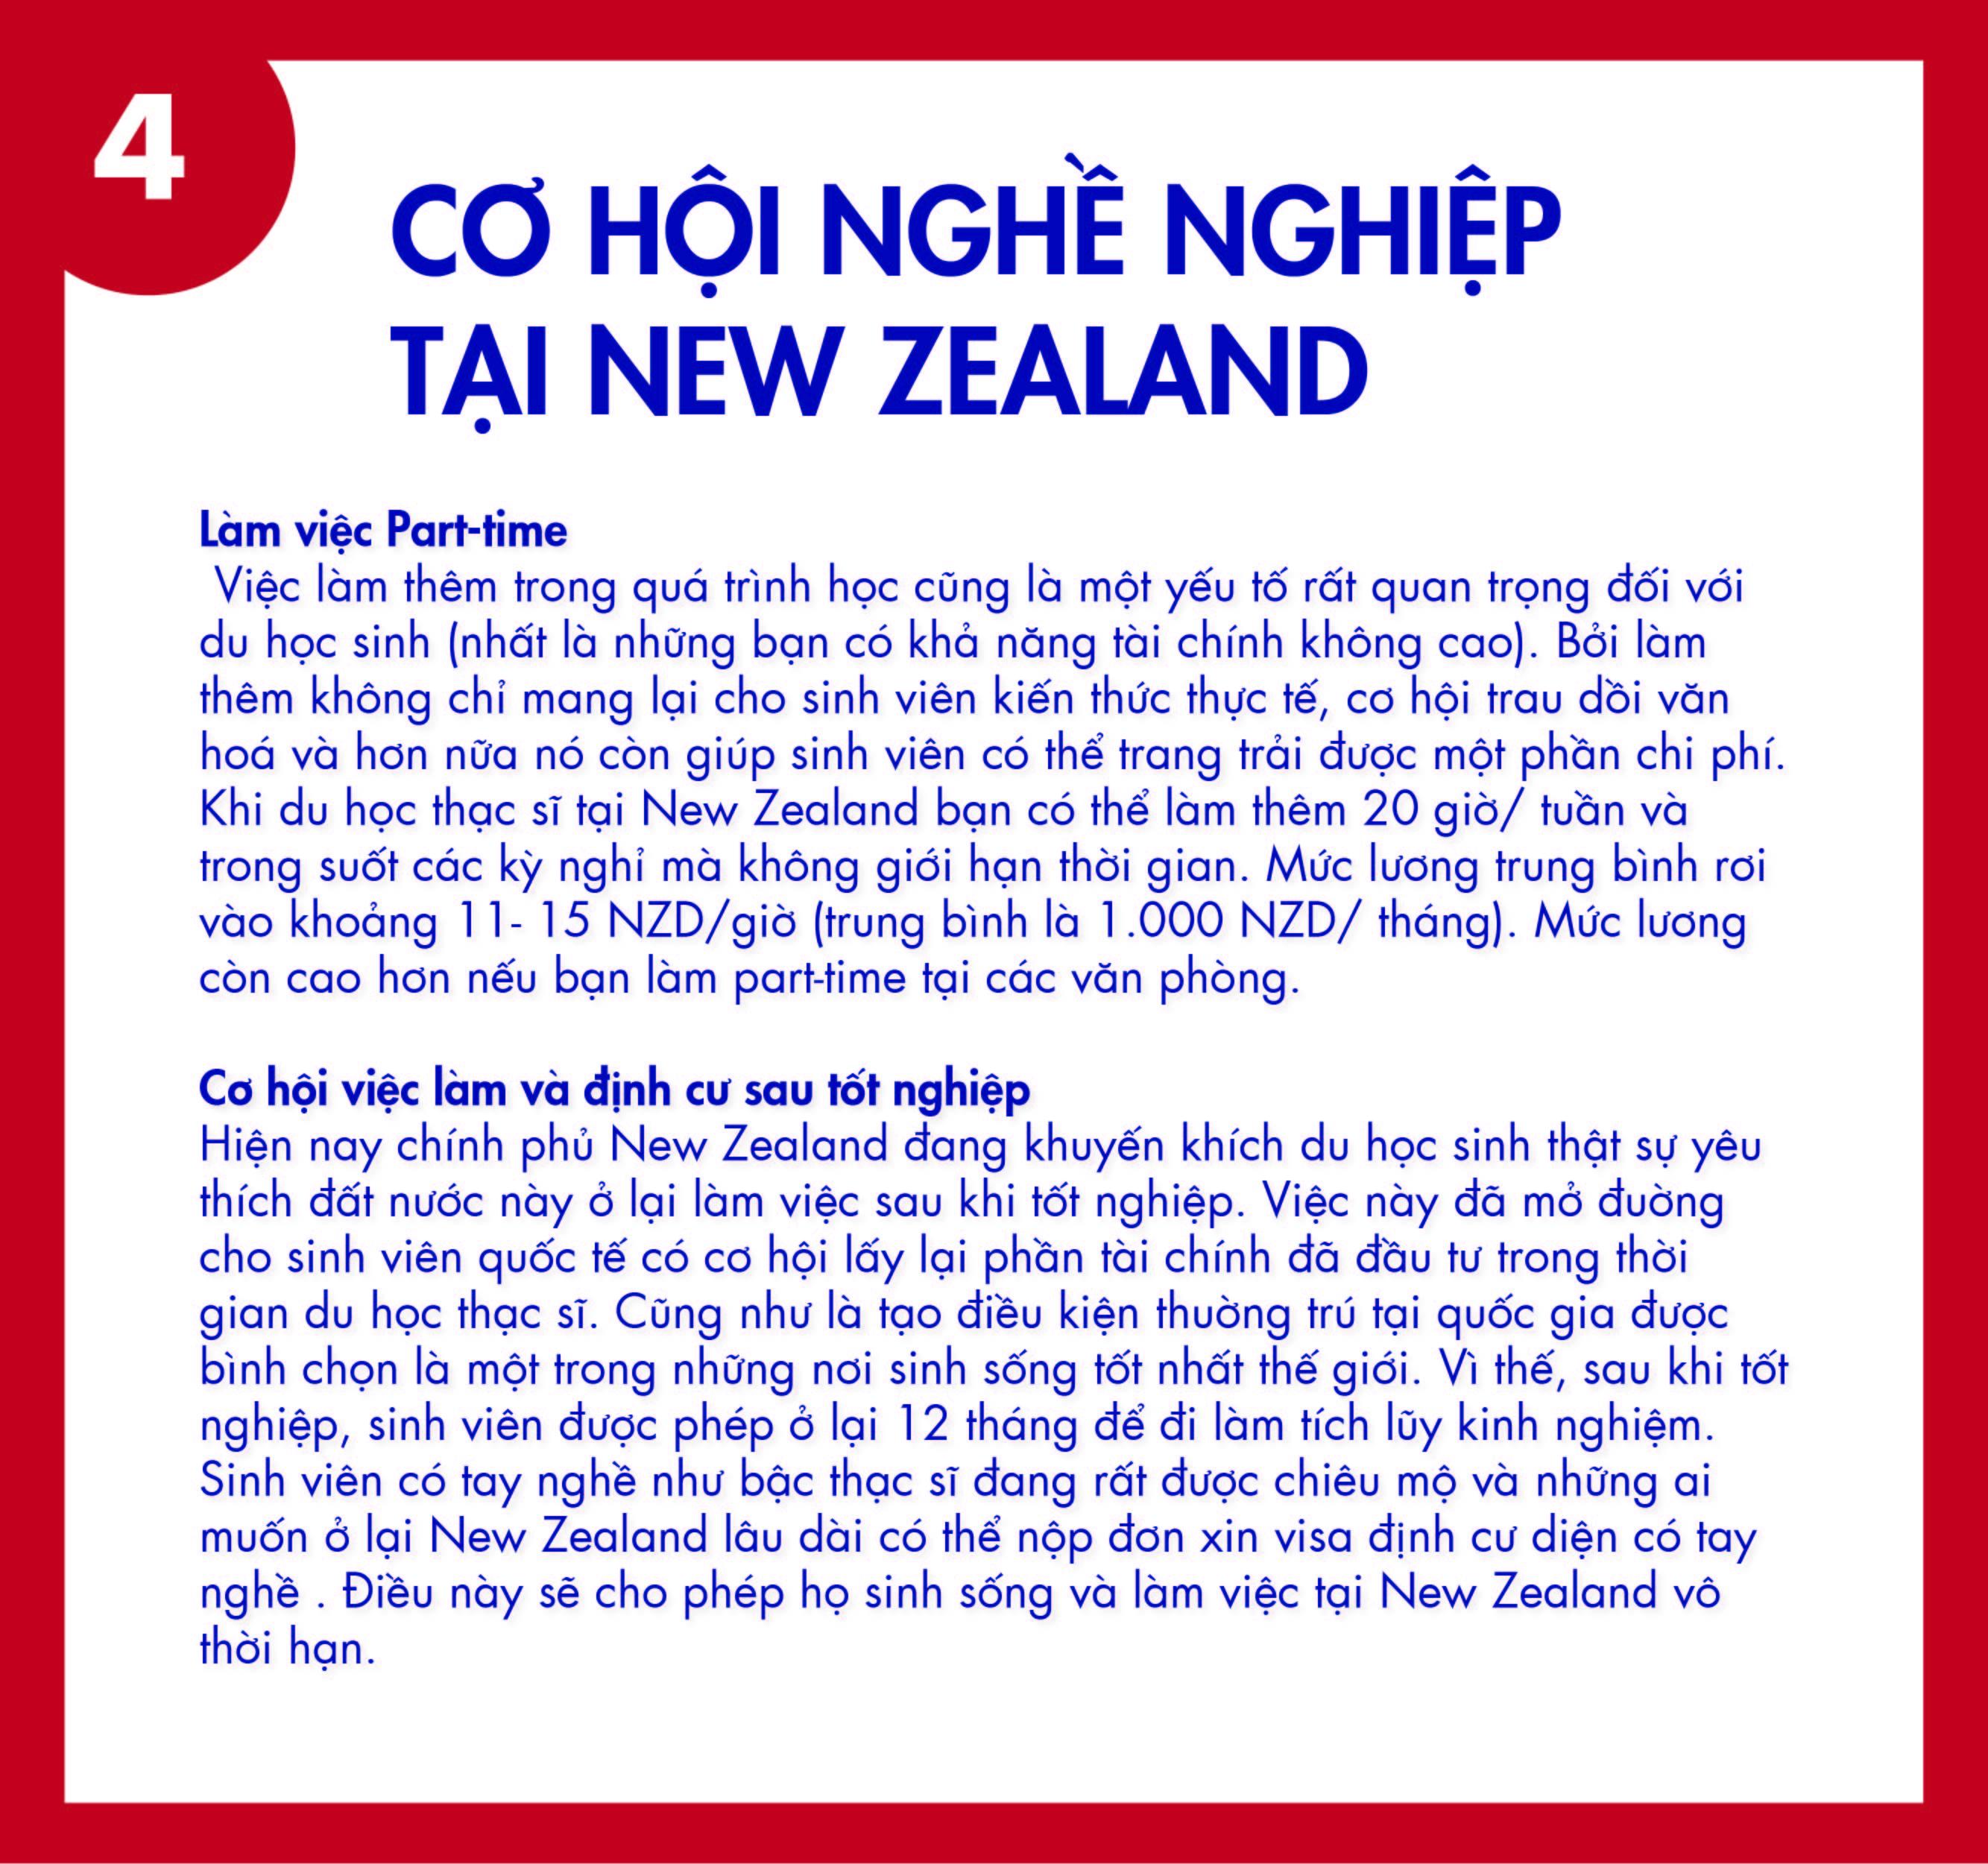 du học thạc sĩ tại New Zealand